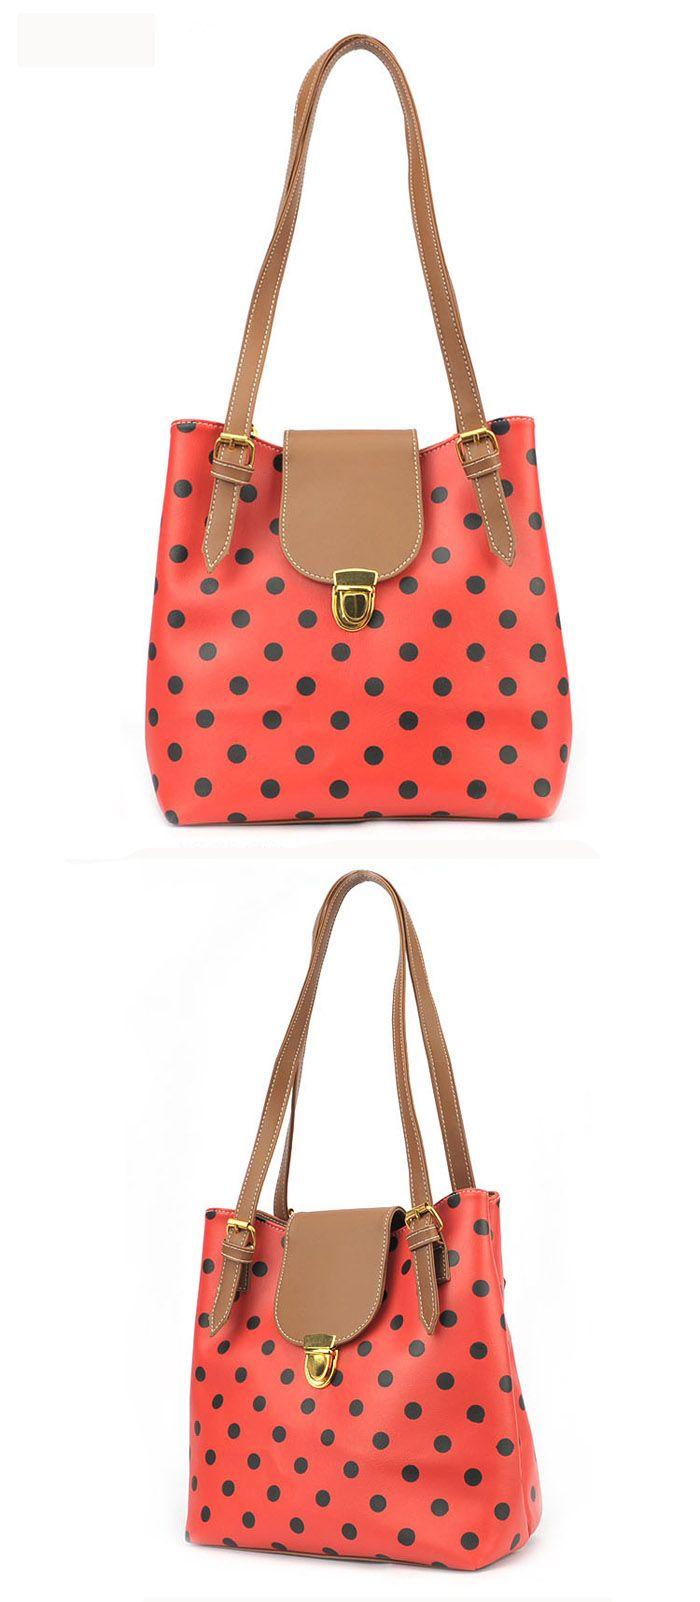 New Arrival Dot Printed and Snap Fastener Design One-Shoulder Bag For Female